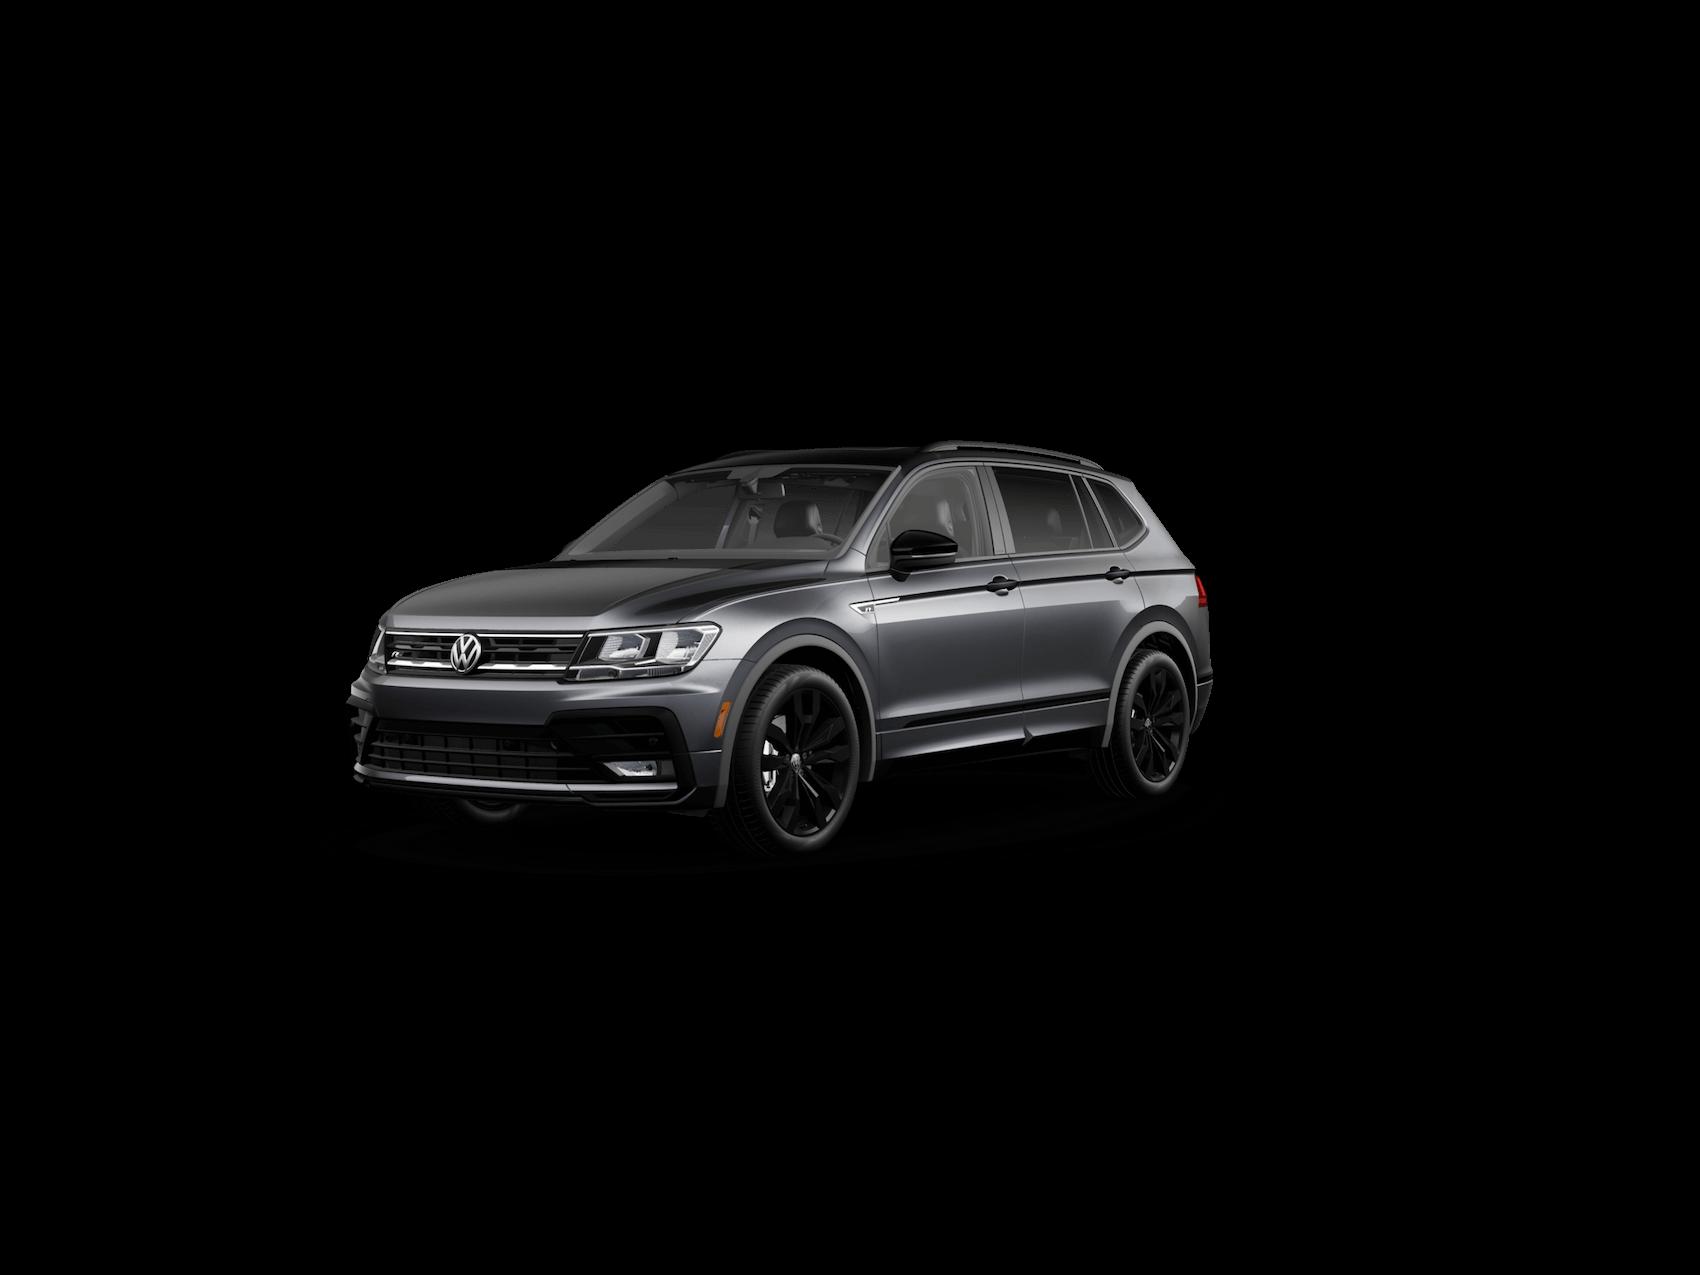 VW Tiguan SE R-Line Black